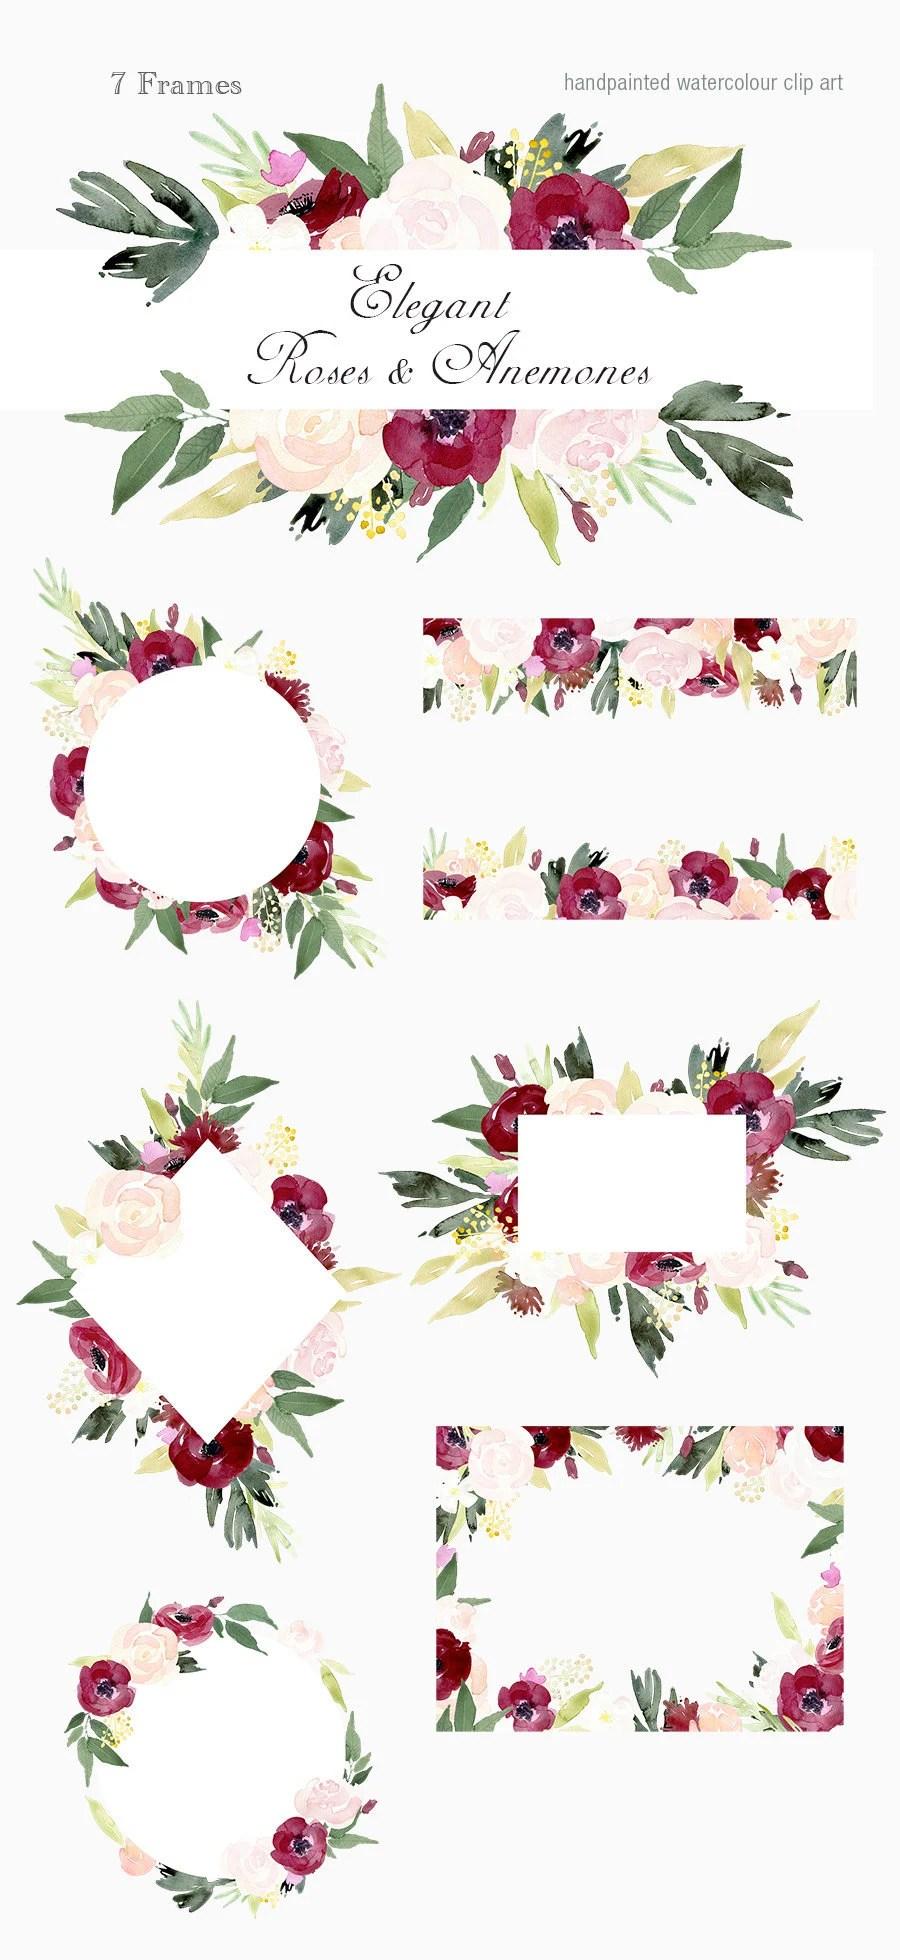 elegant roses and anemones frames